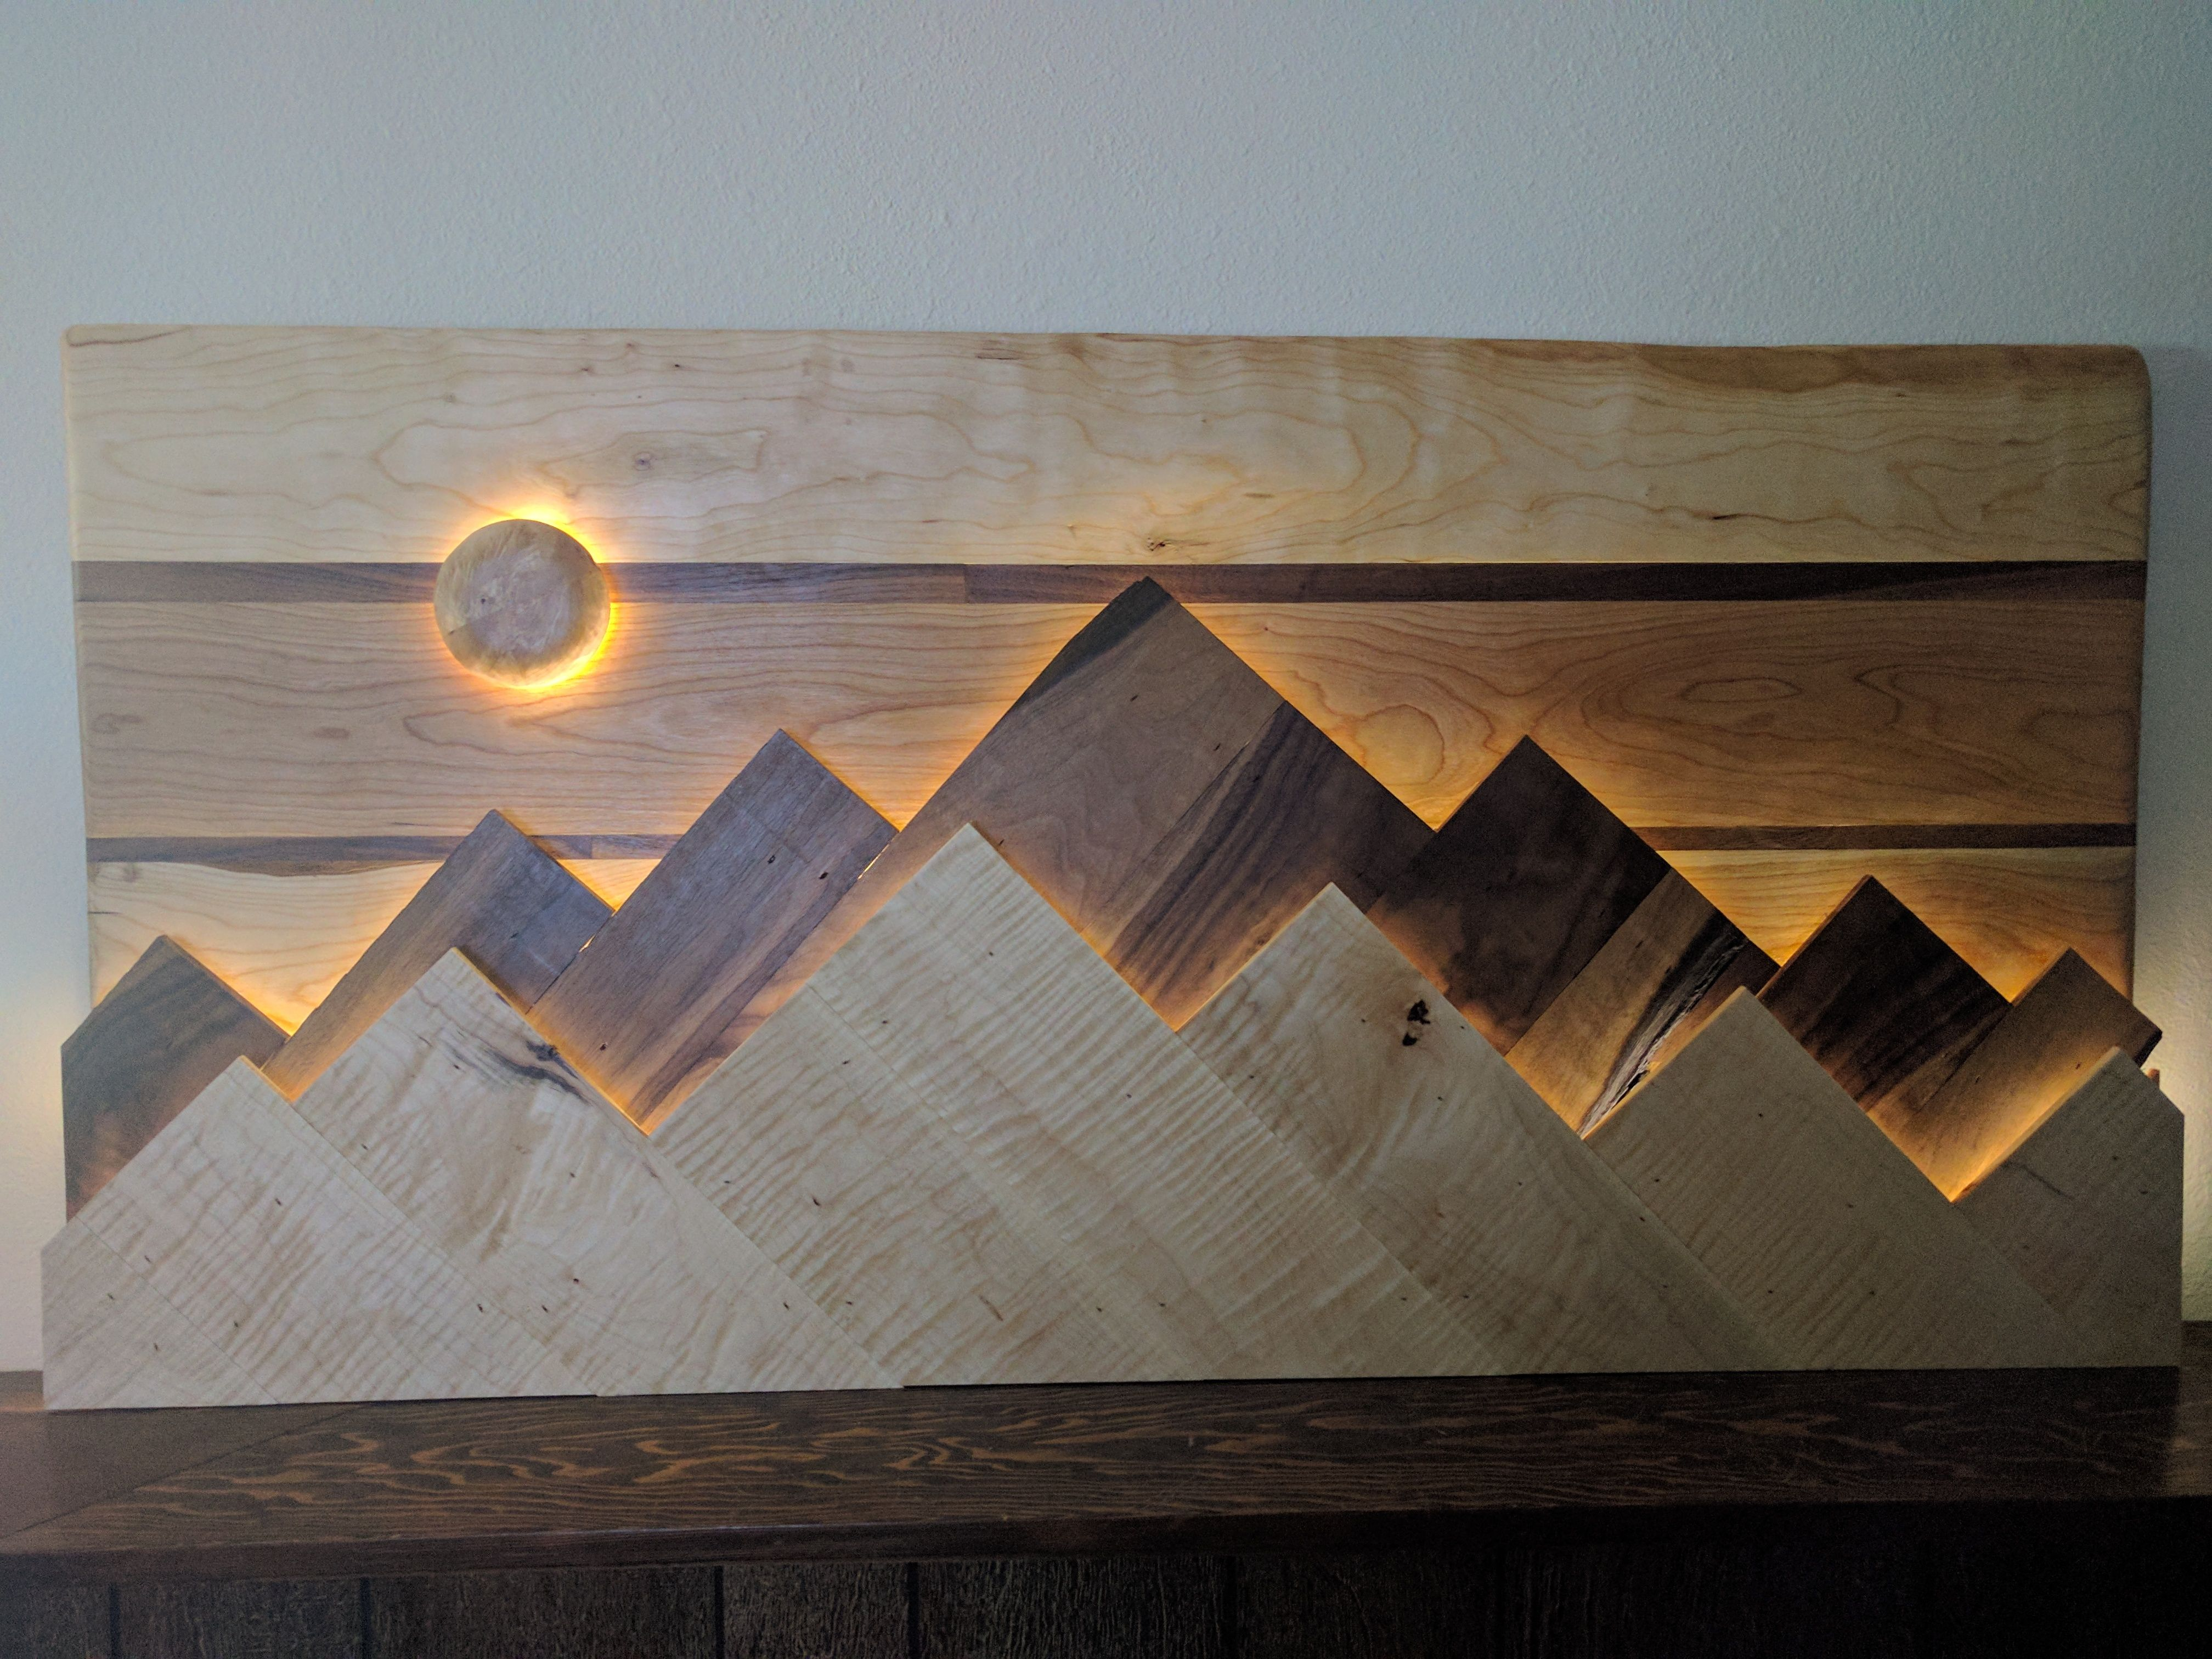 Wood mountain range wall art. The sun/moon functions as a ...